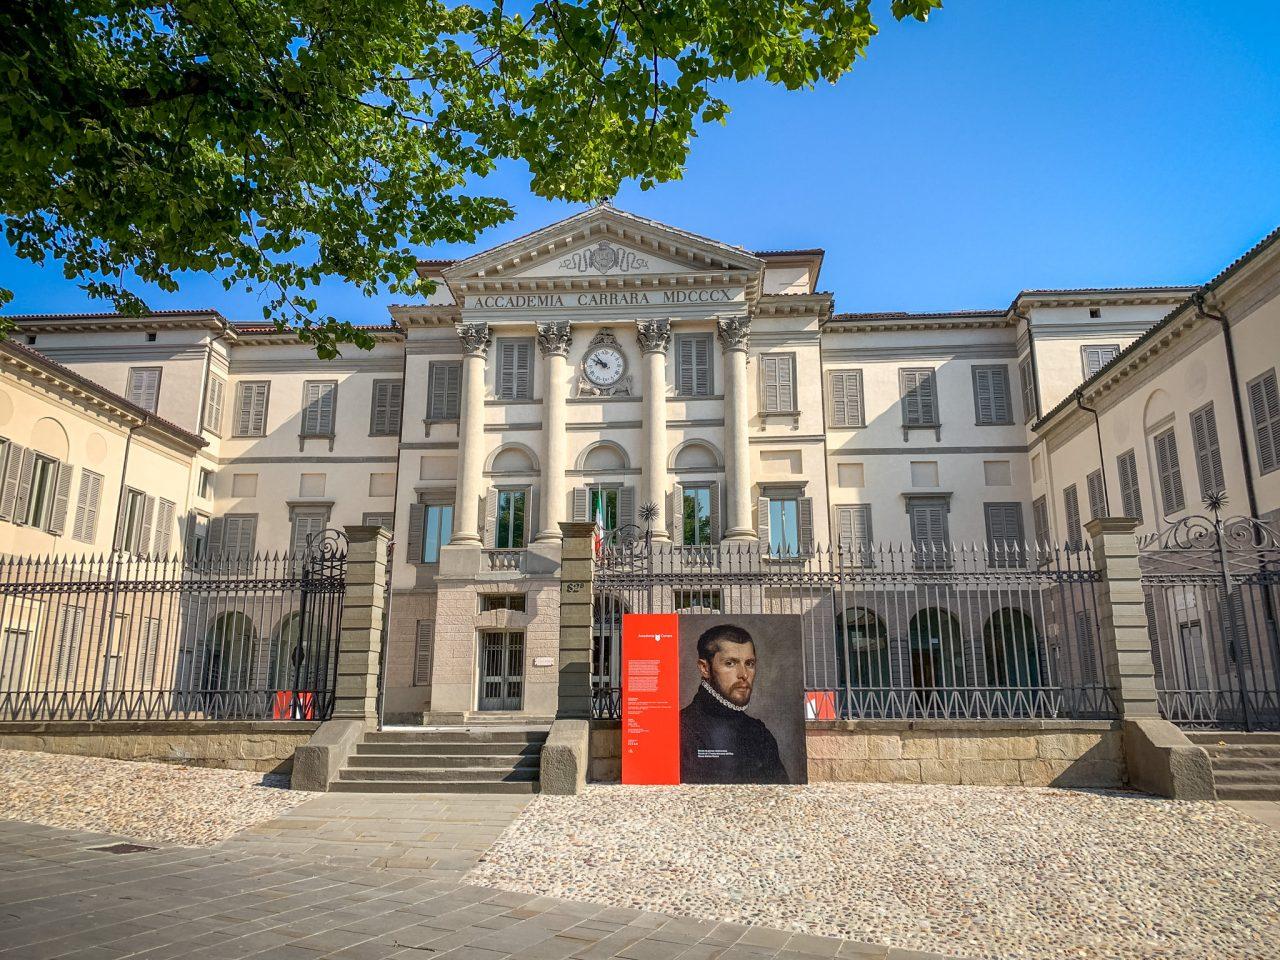 Академии Каррара (Accademia Carrara)